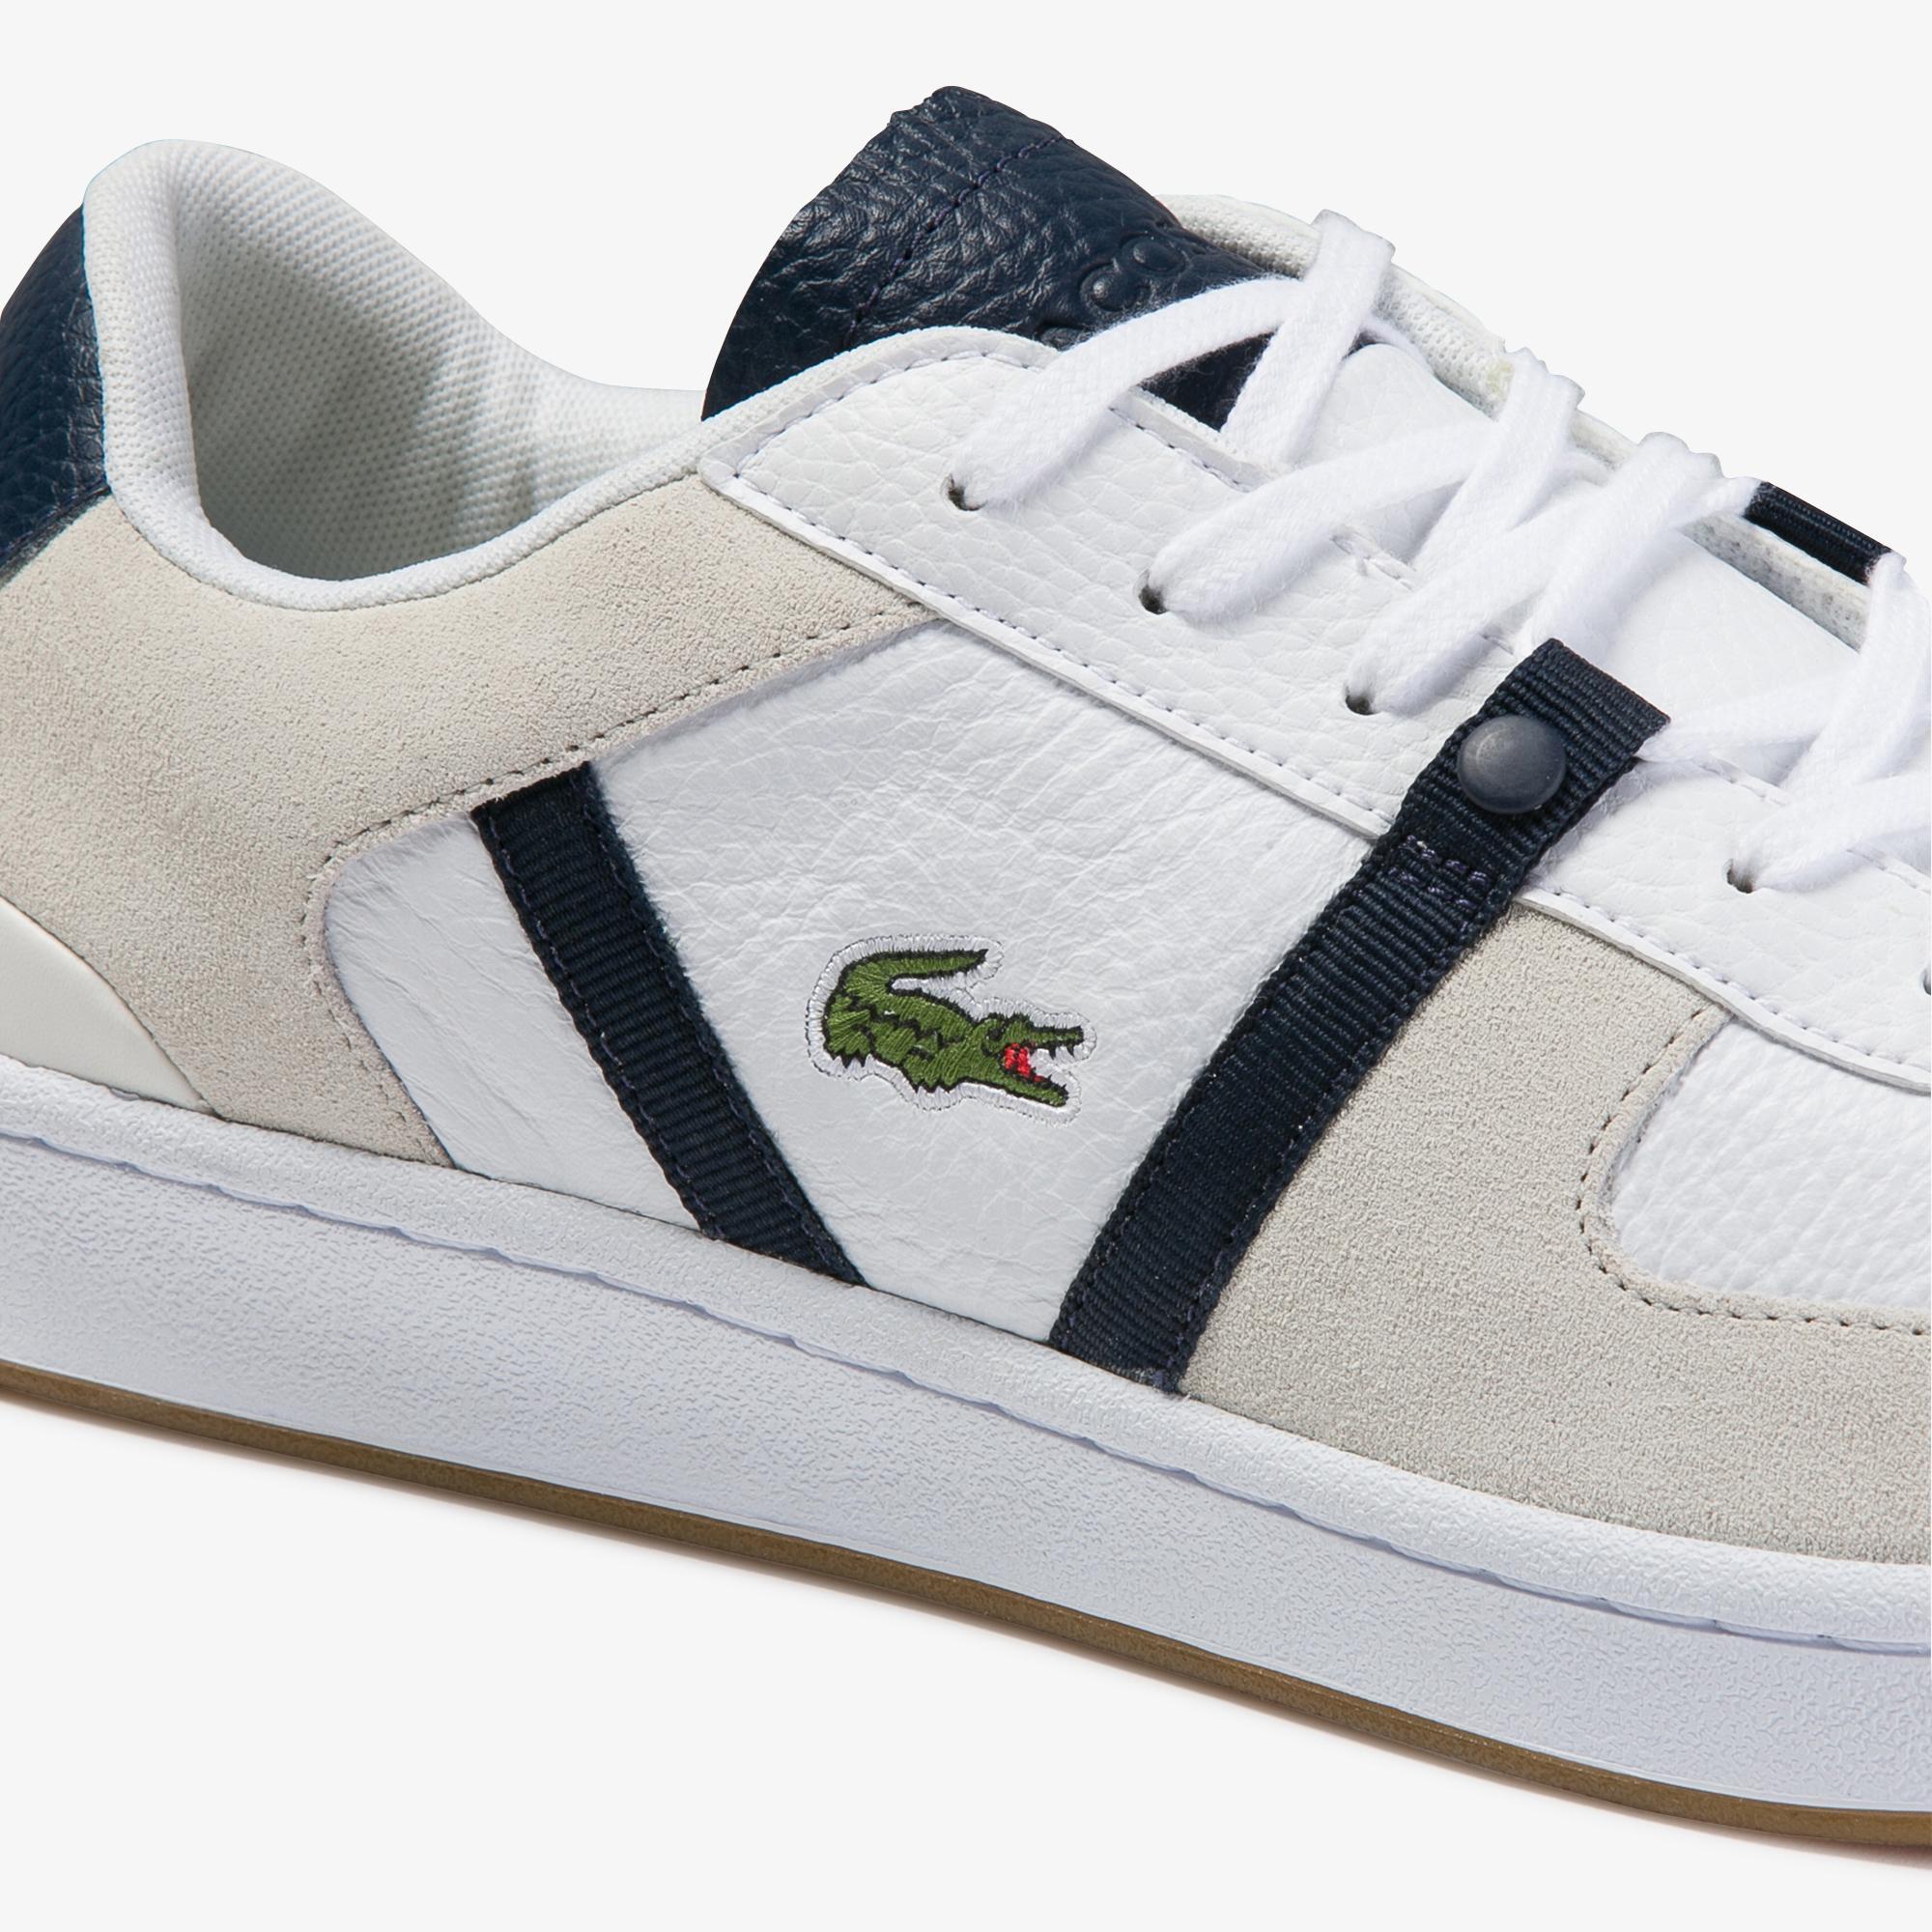 Lacoste Men's Splitstep 120 2 Sma Leather Sneakers